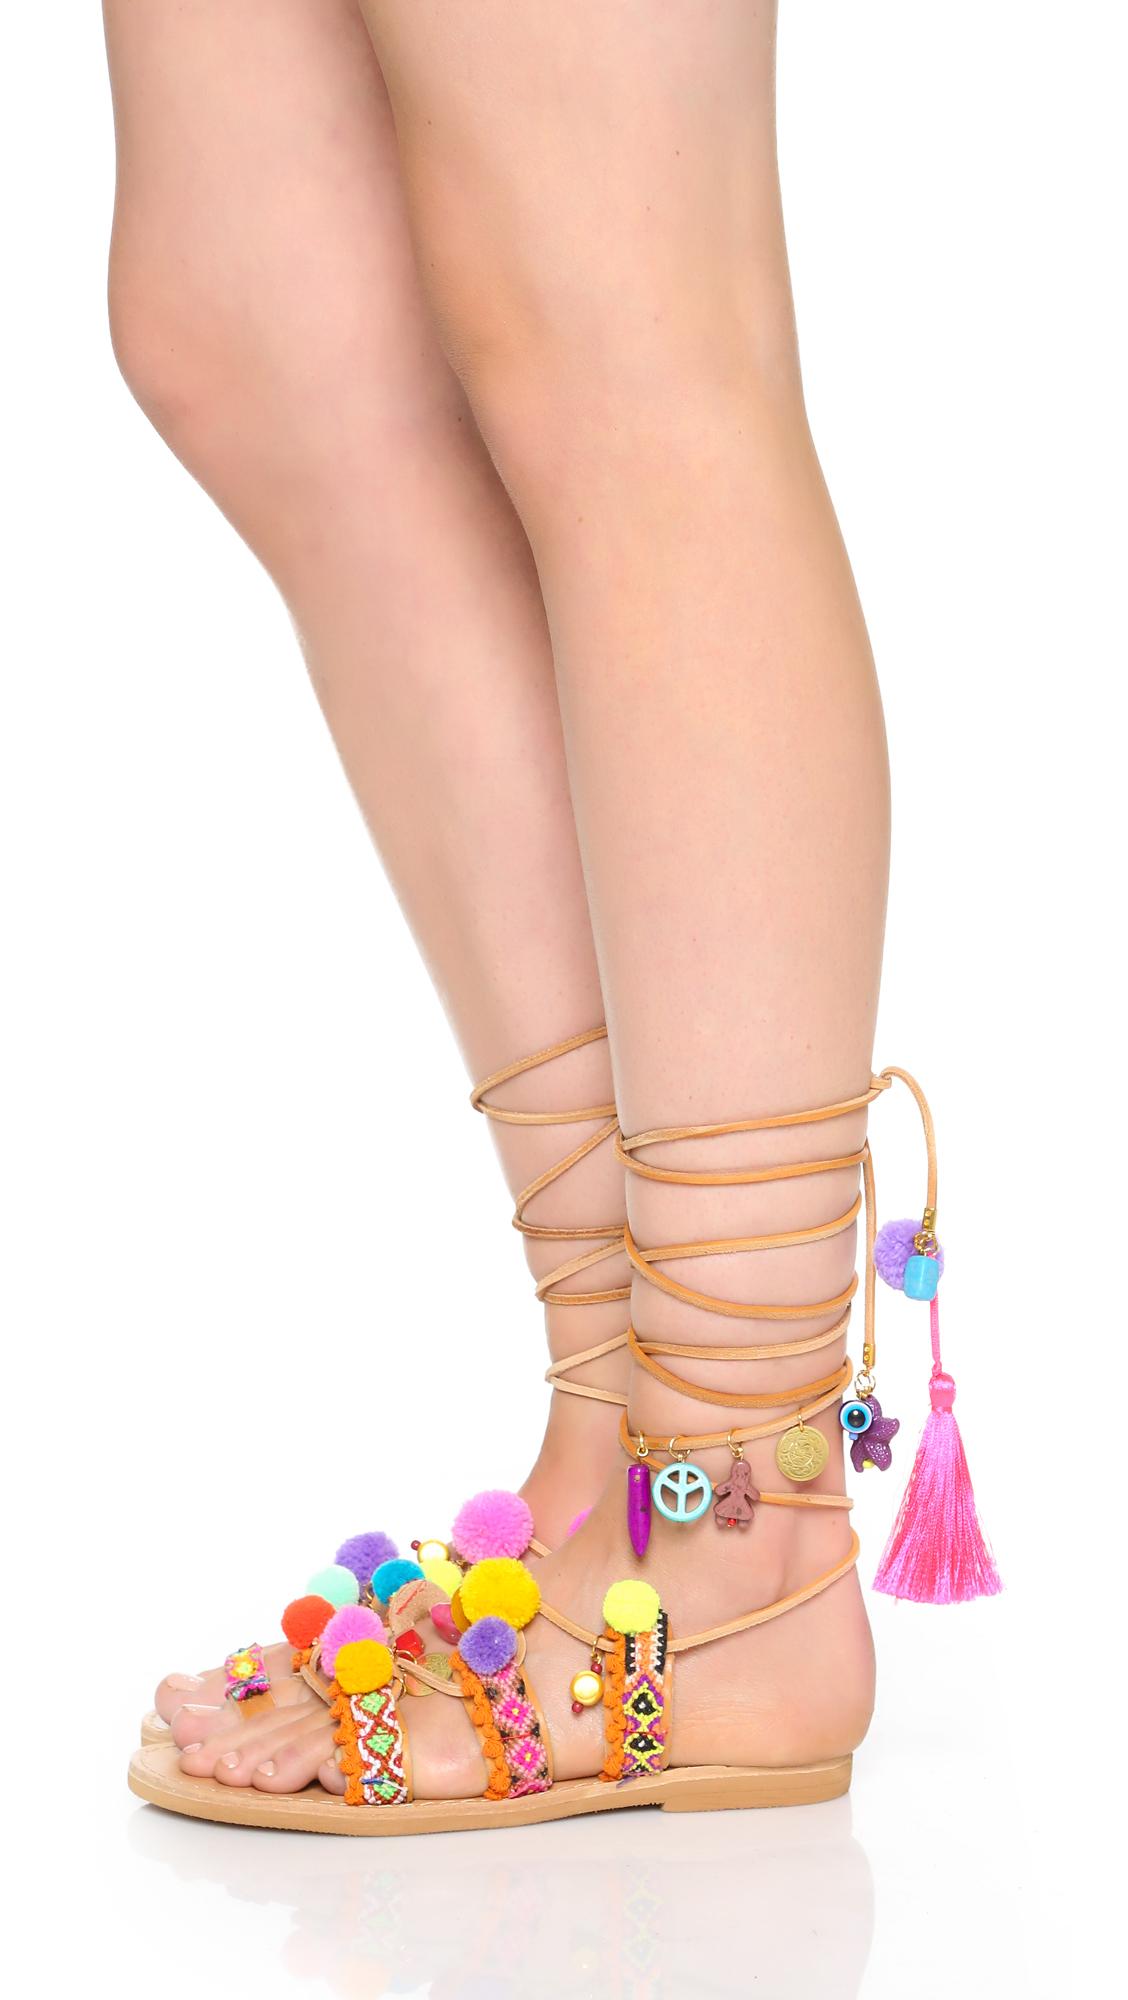 3a69228946d3 Elina Linardaki Penny Lane Lace Up Sandals